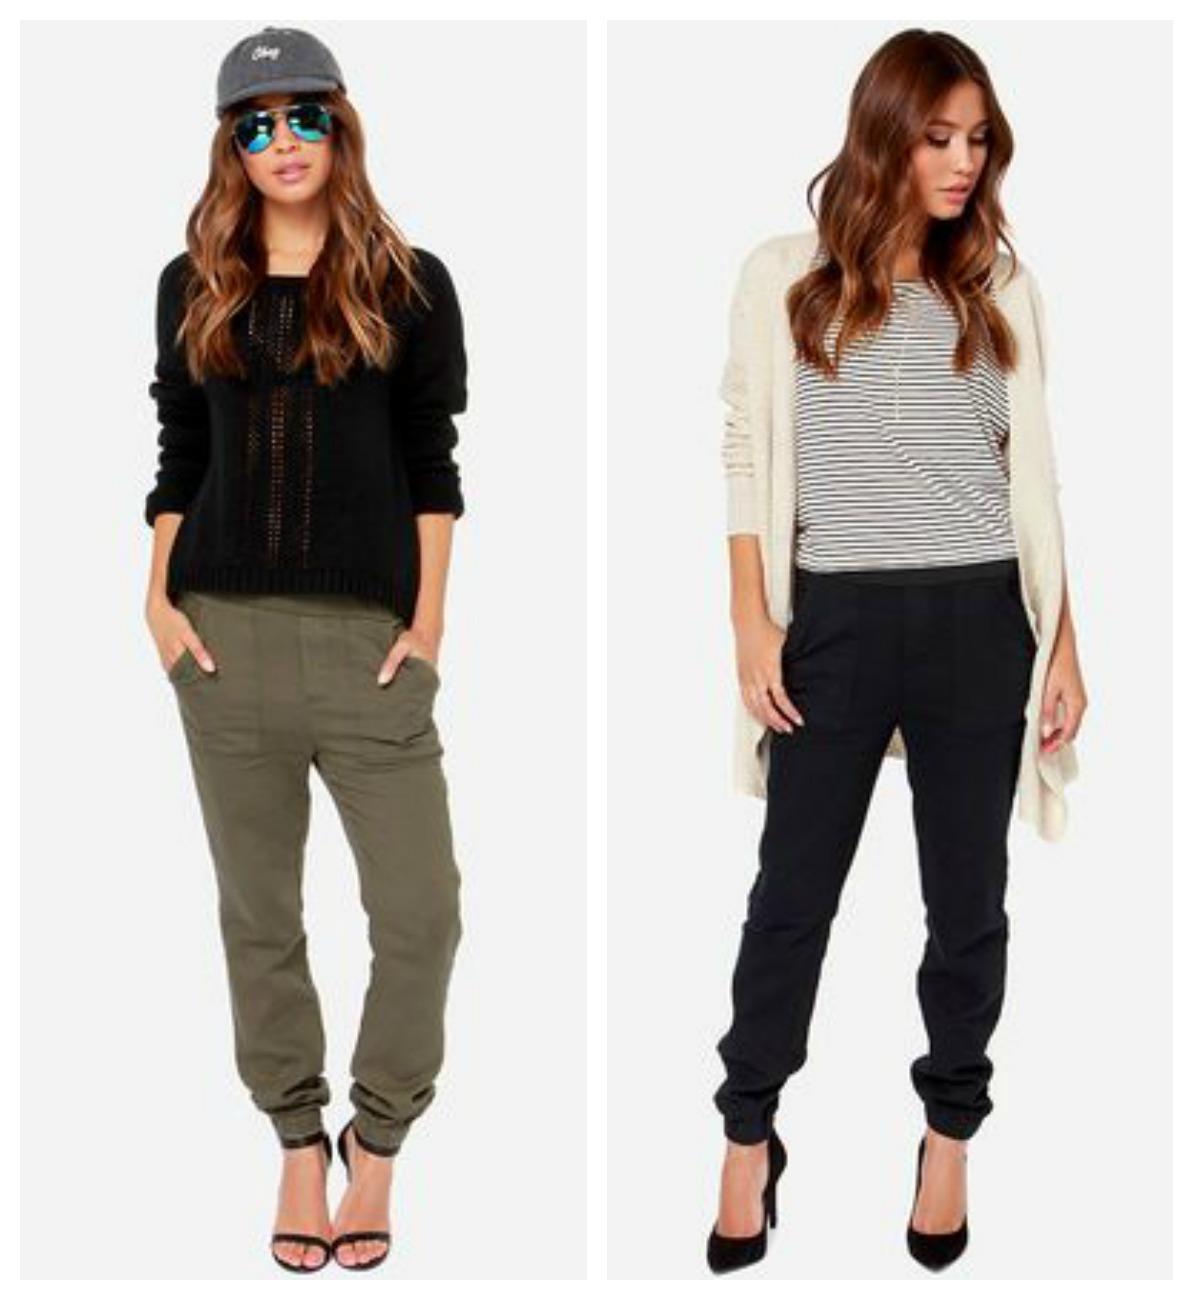 b2fa49821dee slouchy pants – KMK Style Blog